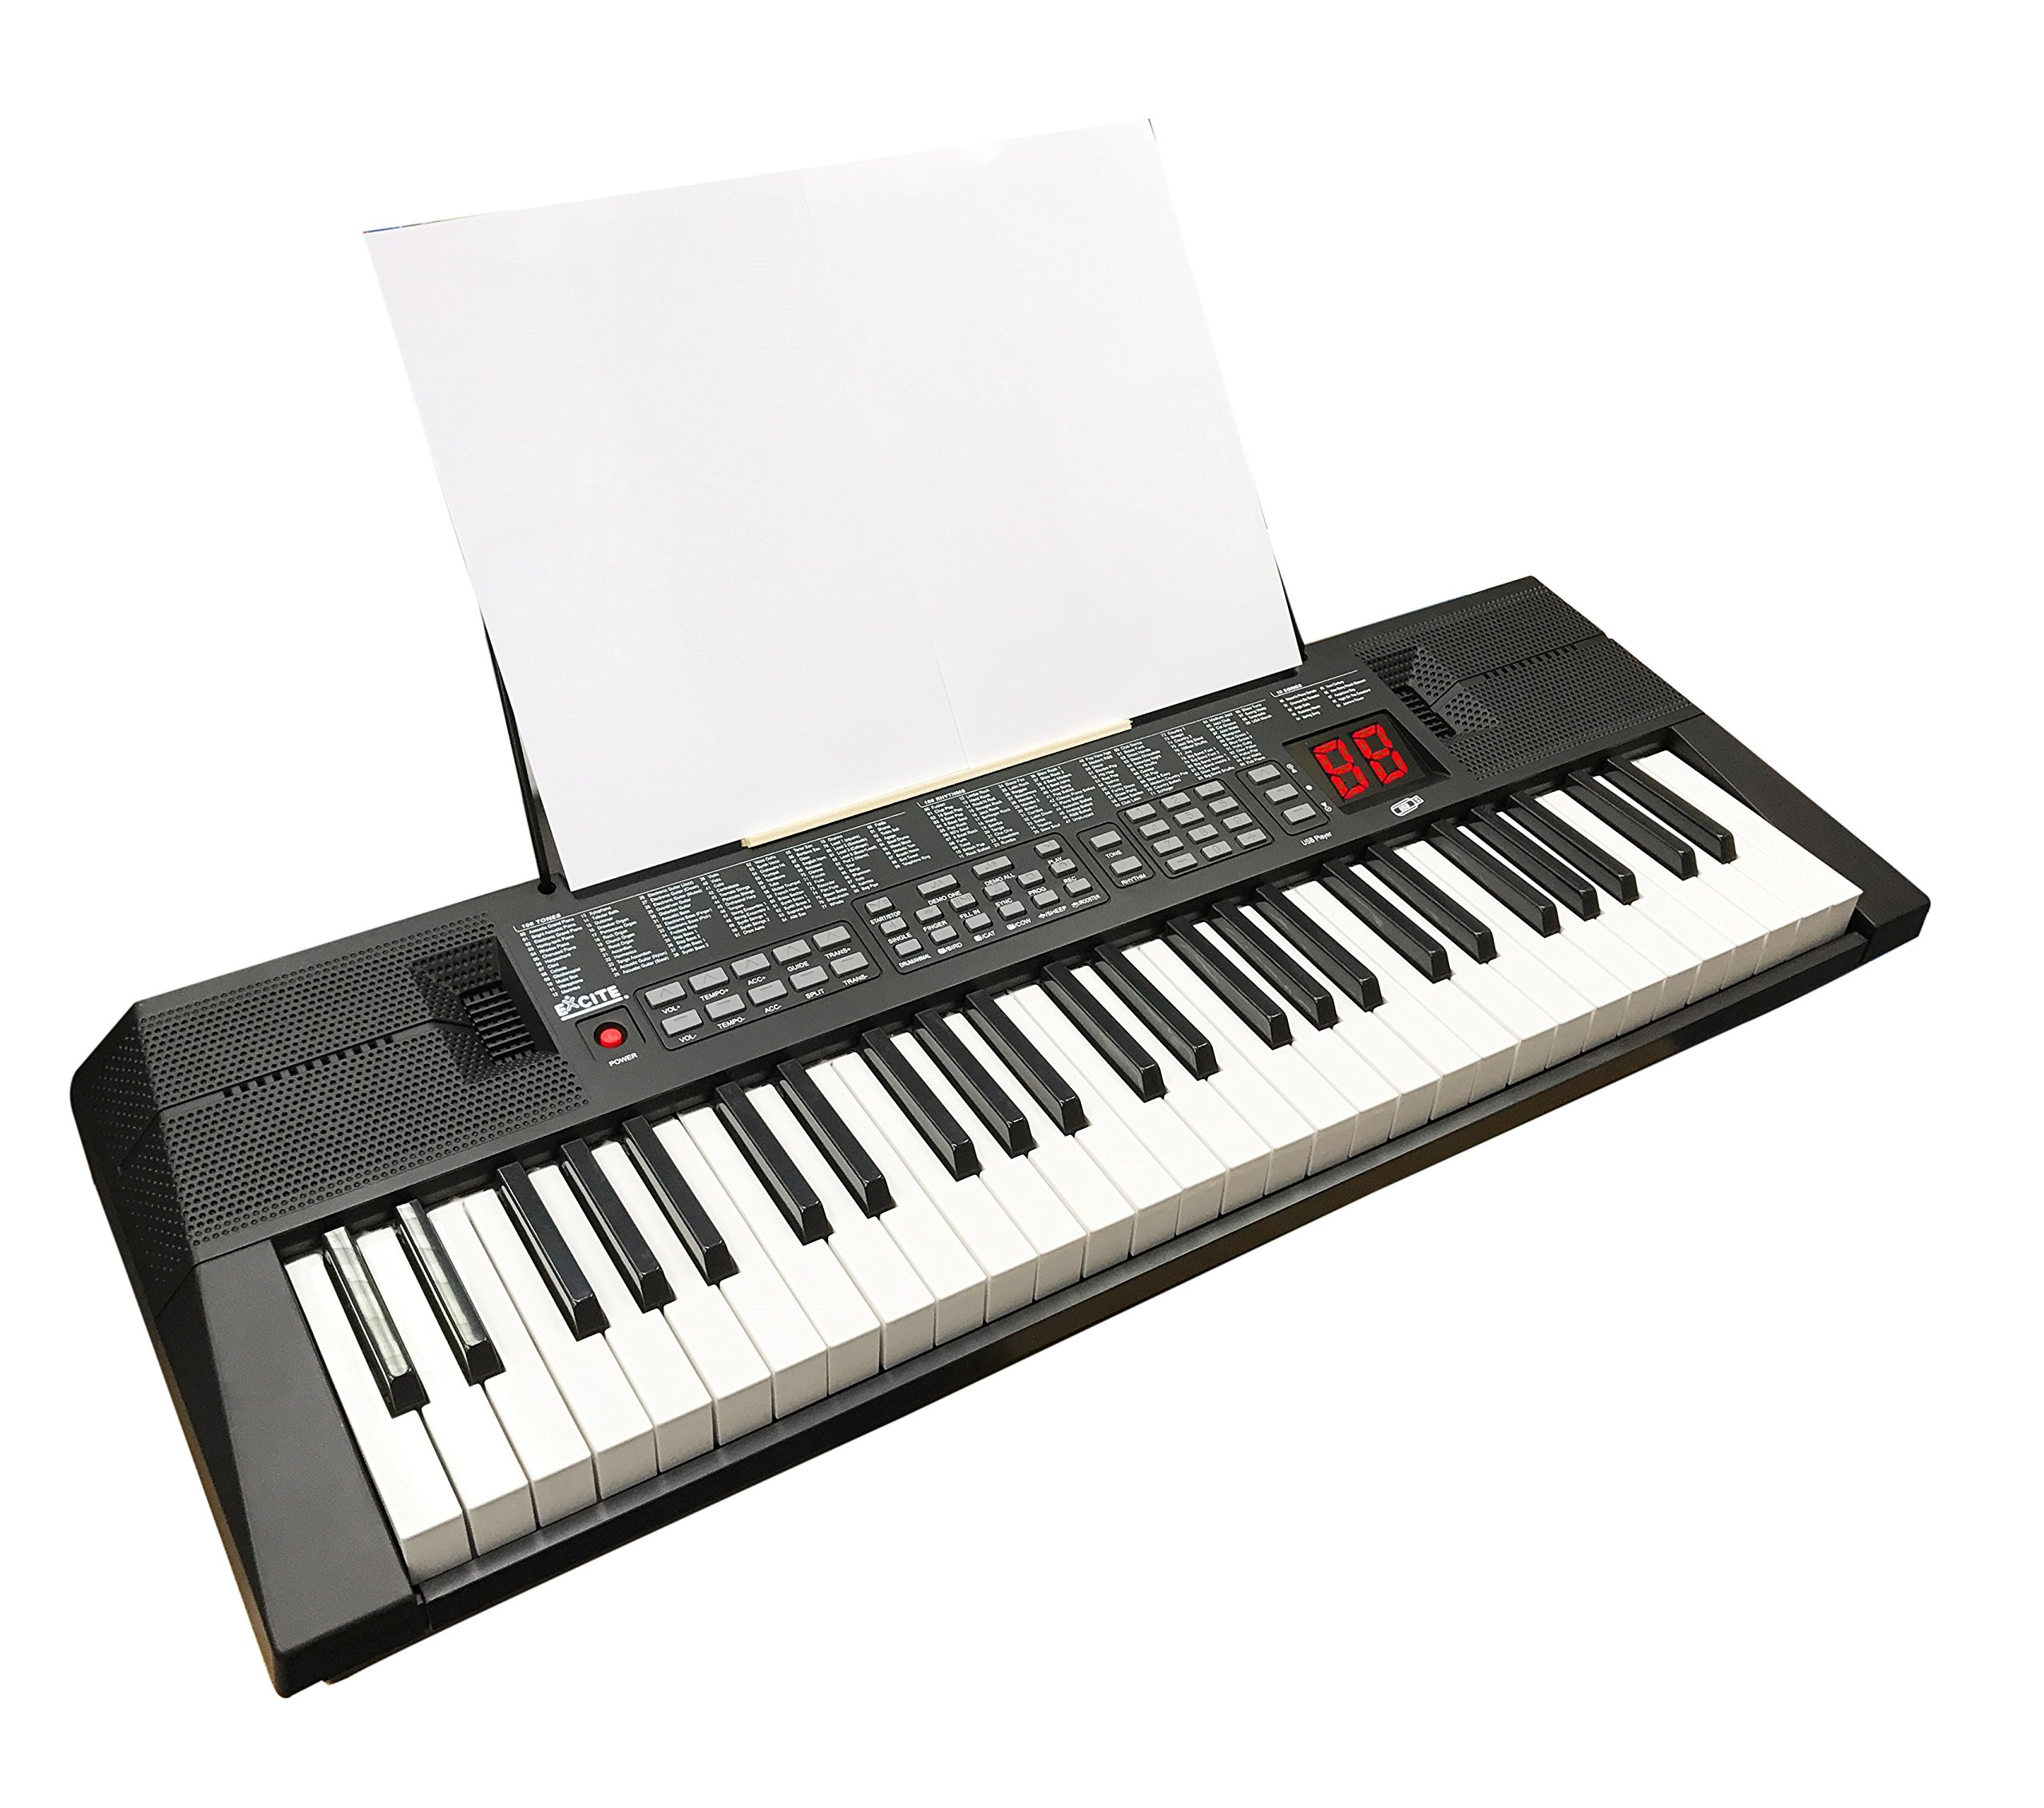 Electronic Music Piano Digital Keyboard - 54 piano keys